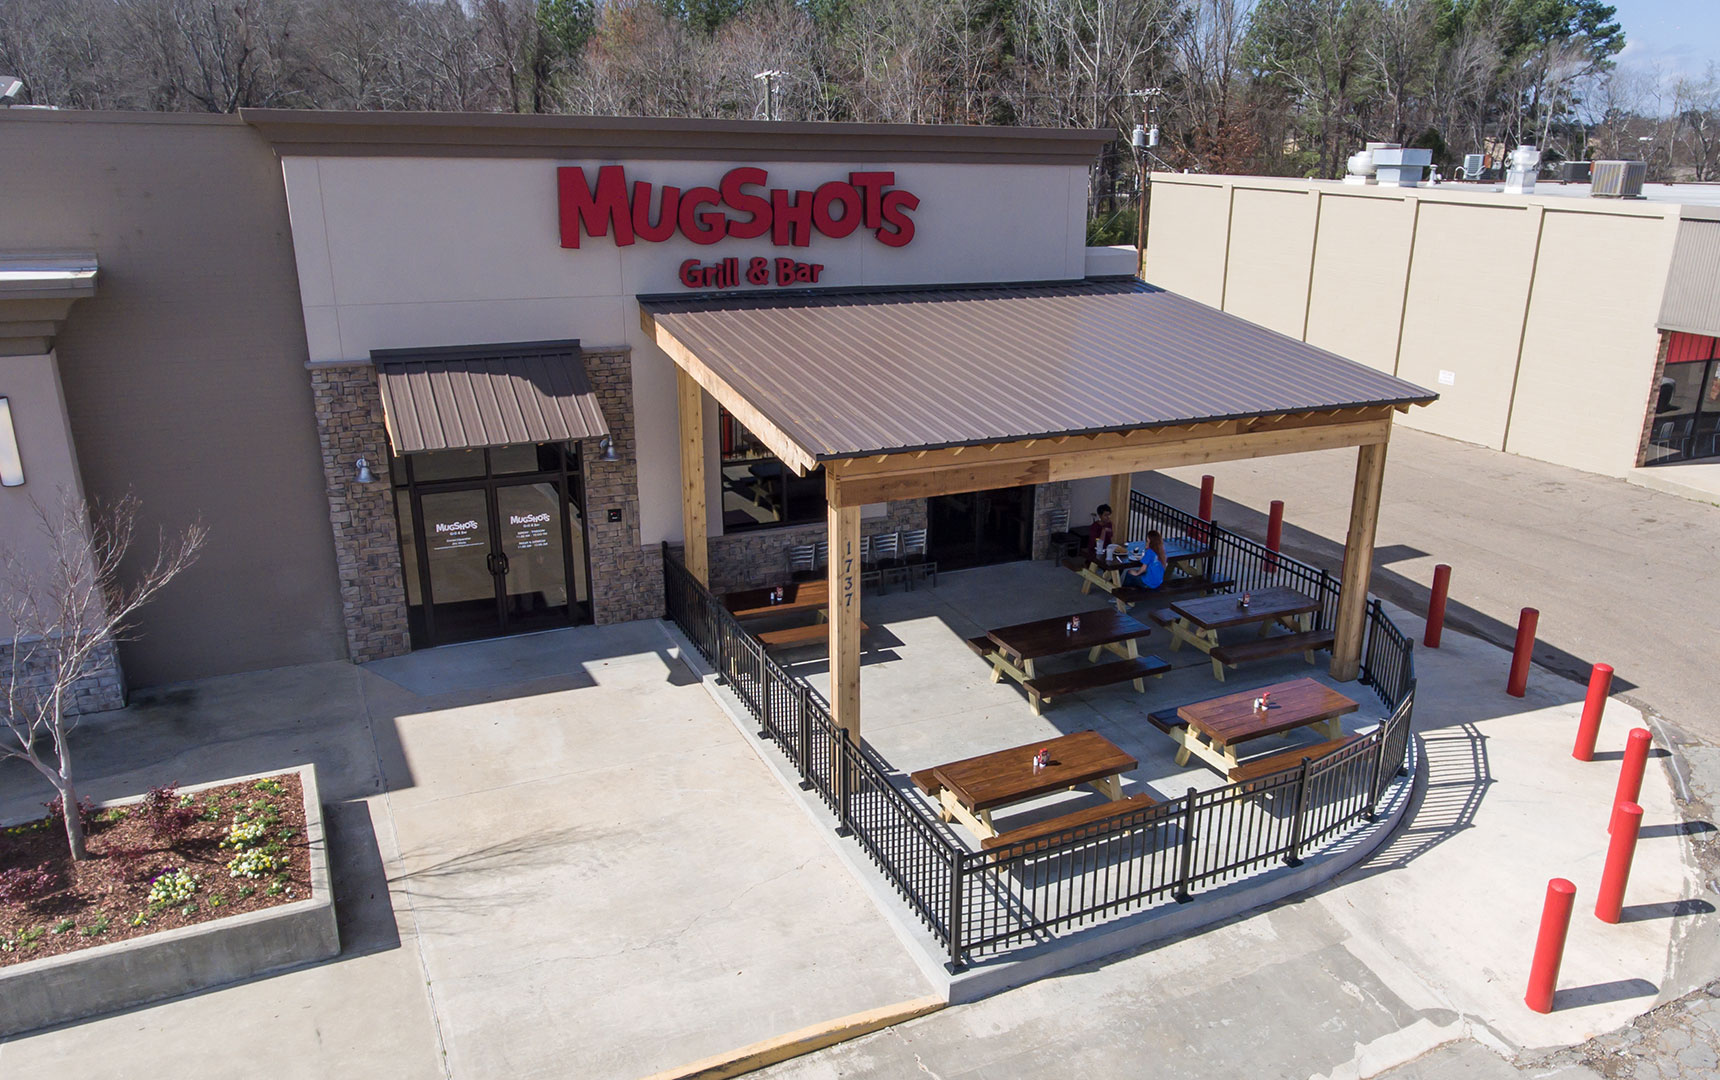 Columbus, MS — Mugshots Grill & Bar